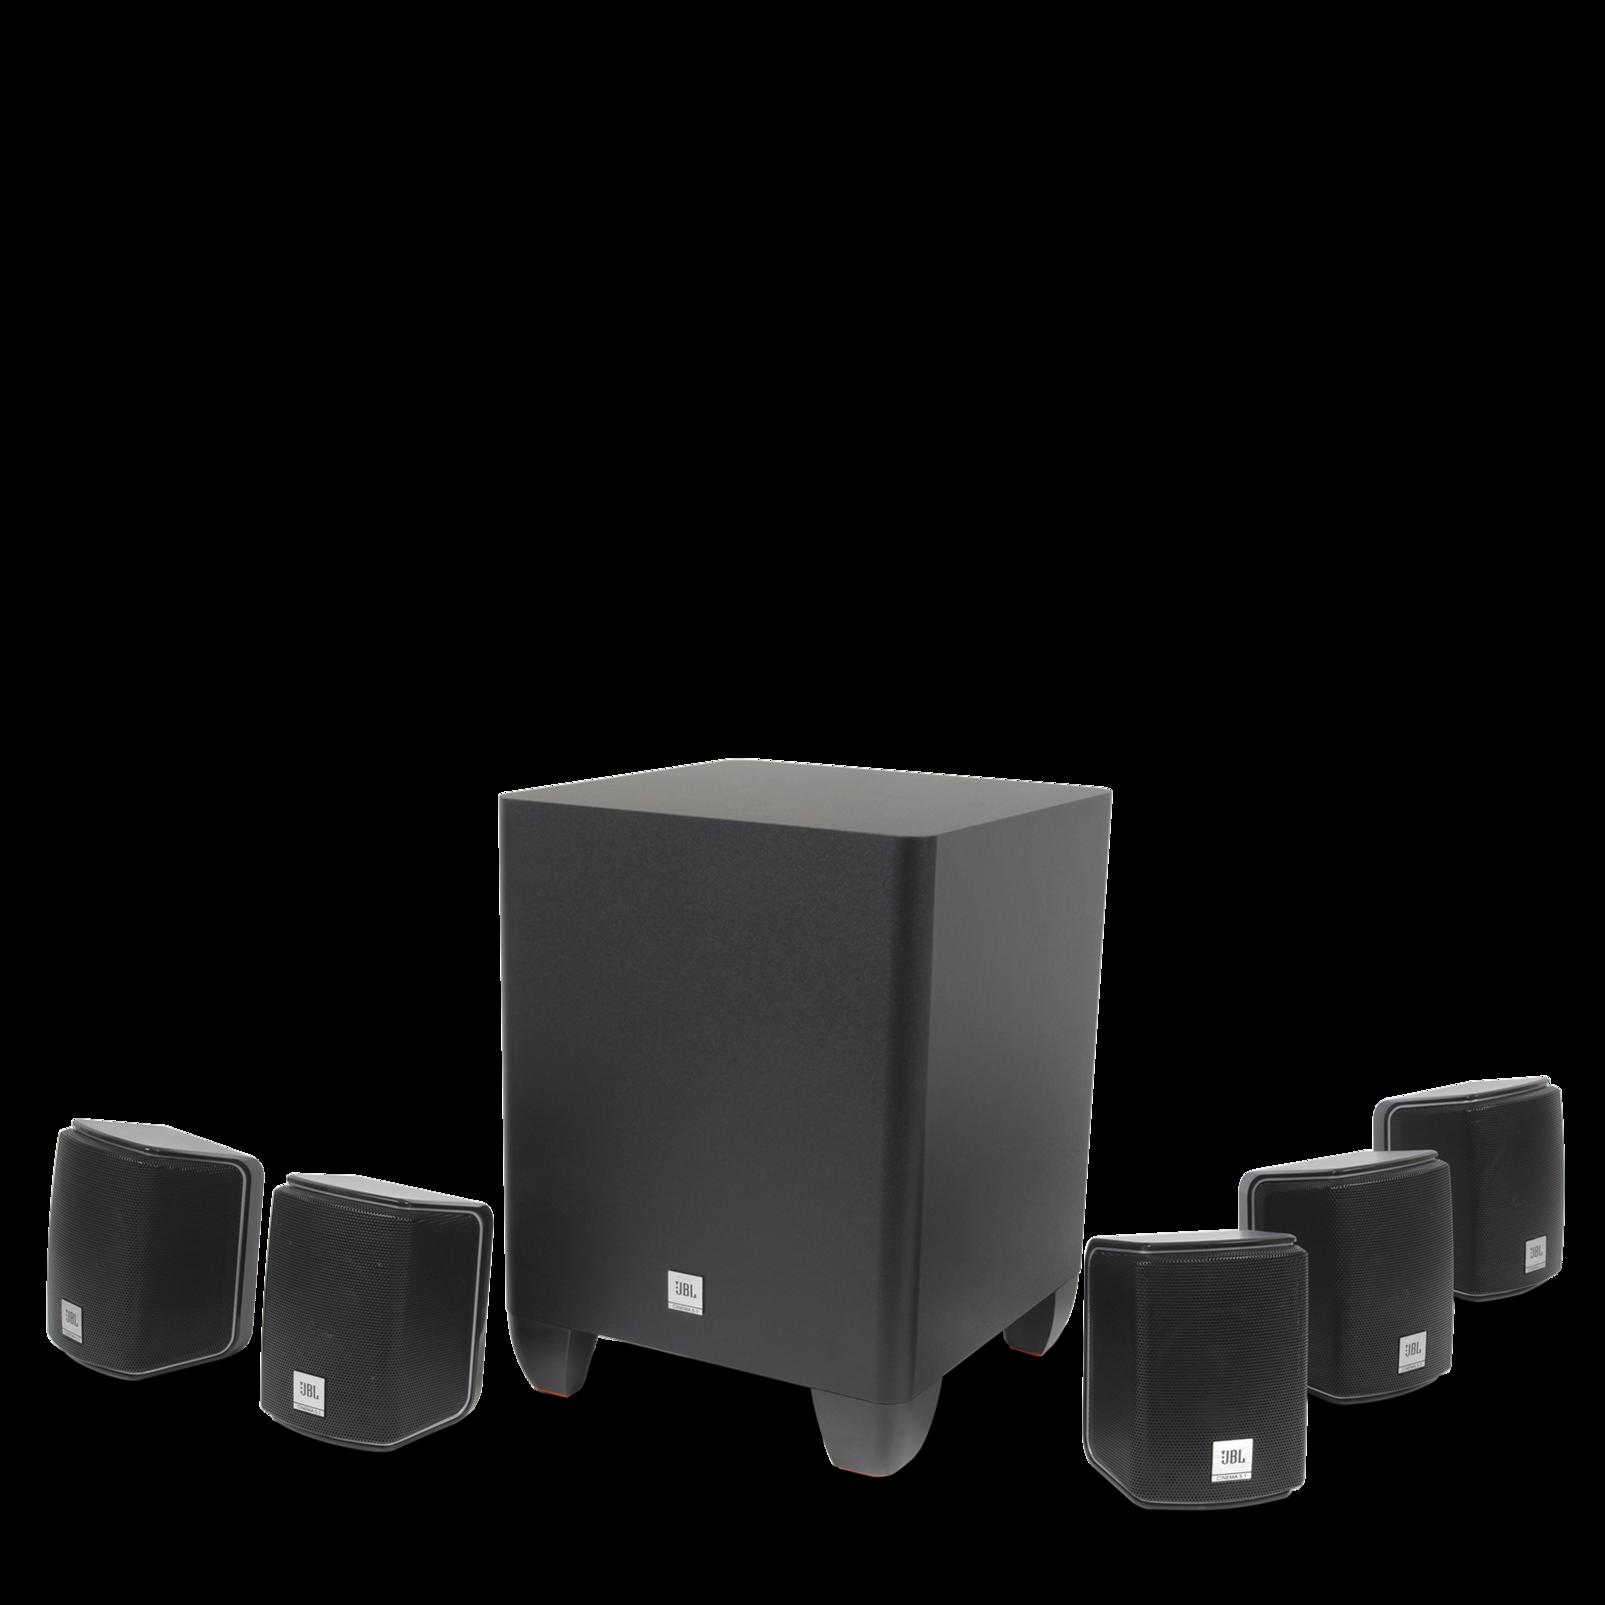 jbl cinema 510 5 1 speaker system rh uk jbl com www JBL Home Theater jbl home cinema 510 manual